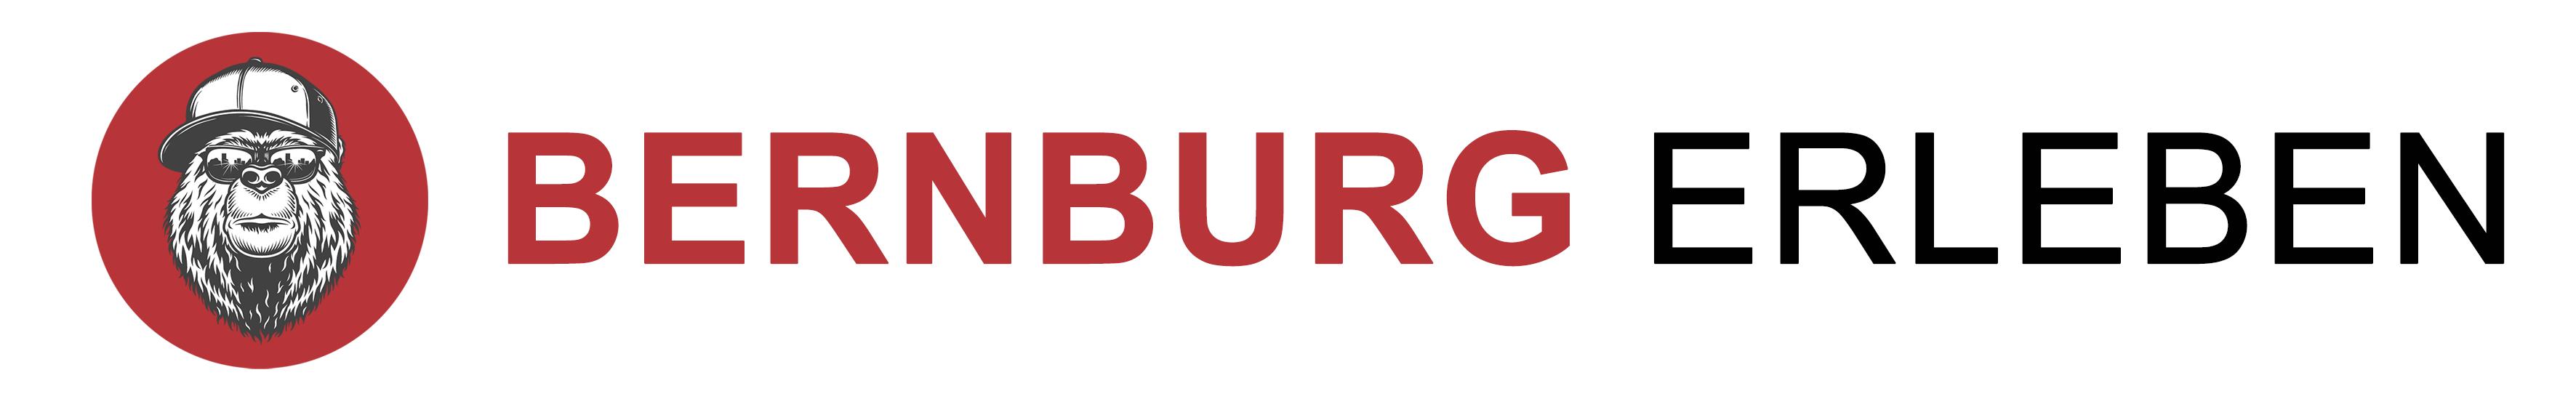 Bernburg erleben